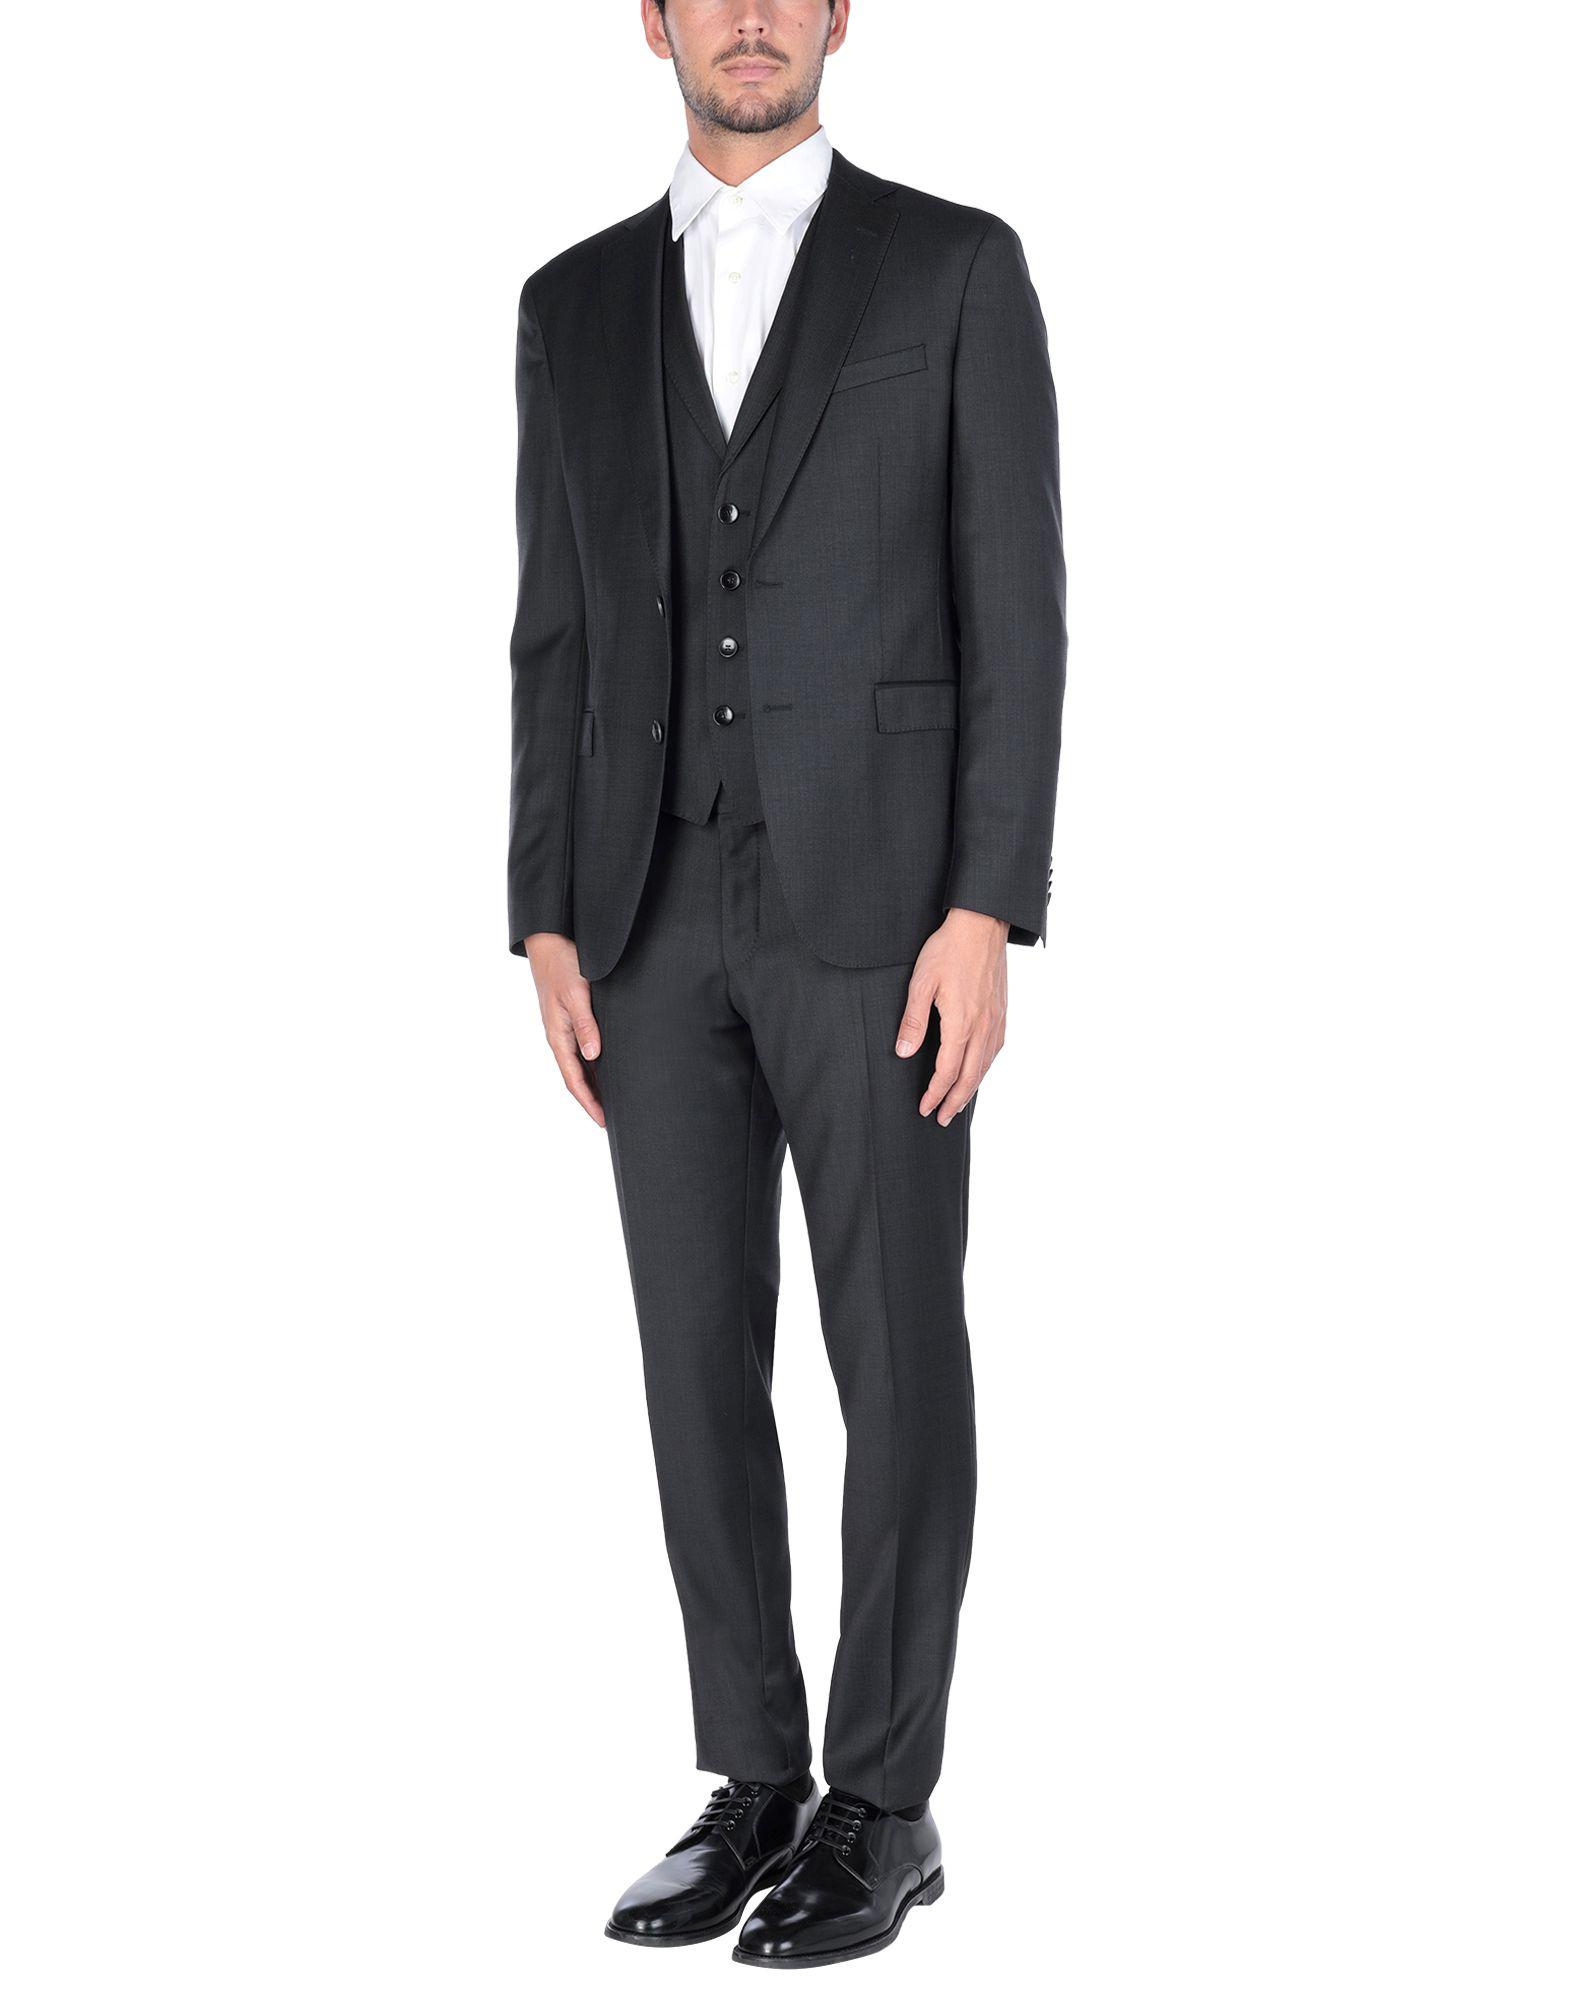 BOSS HUGO BOSS Костюм костюм пиджак и брюки hugo boss костюм пиджак и брюки page 2